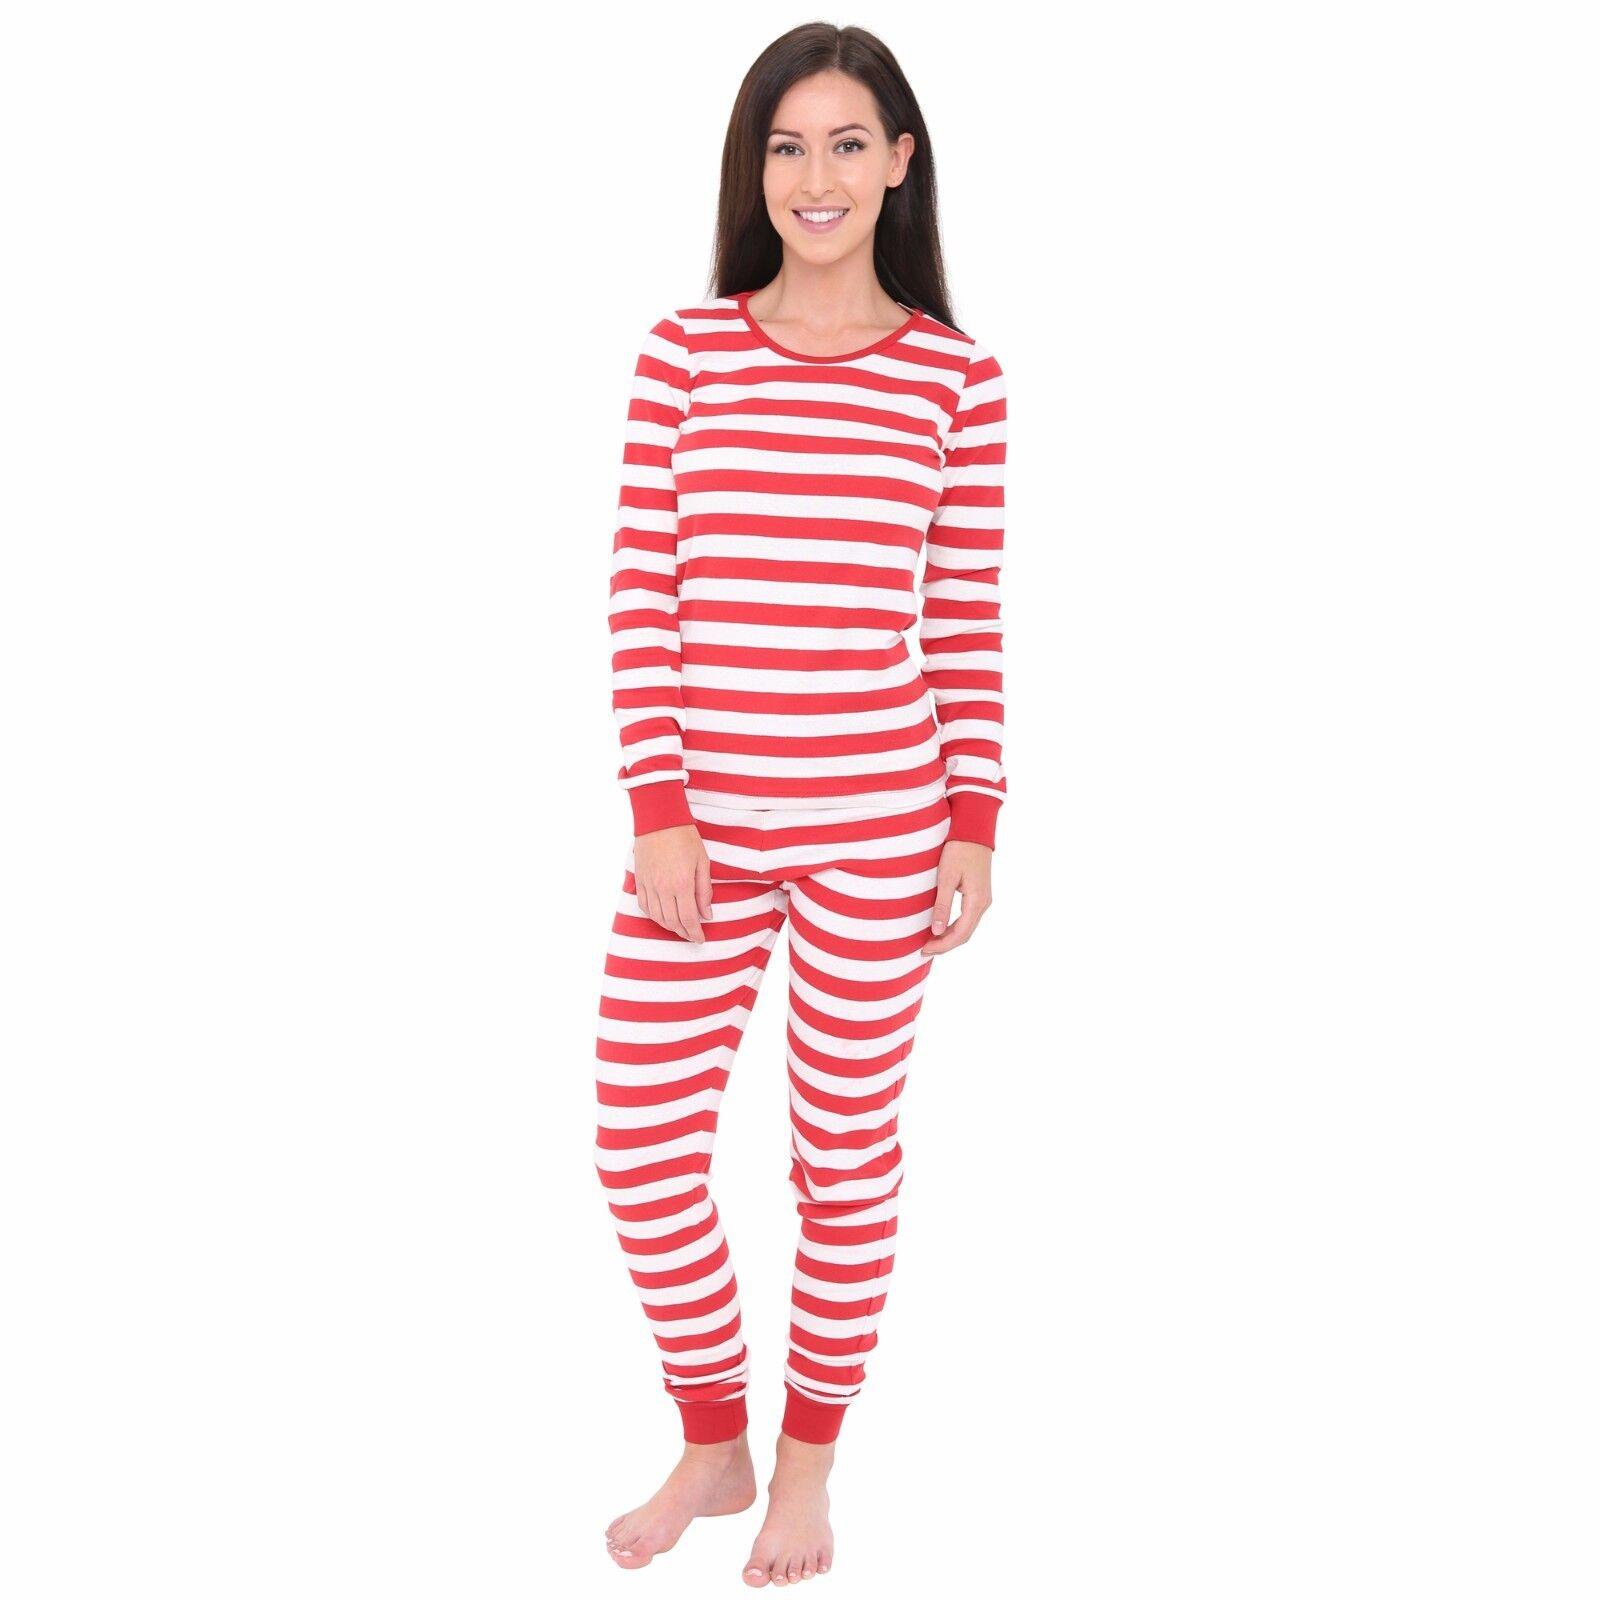 74143bbb16 Details about Women's Long Sleeve Fitted Striped Casual Jersey PJ 2 Piece  Pajama Set Sleepwear